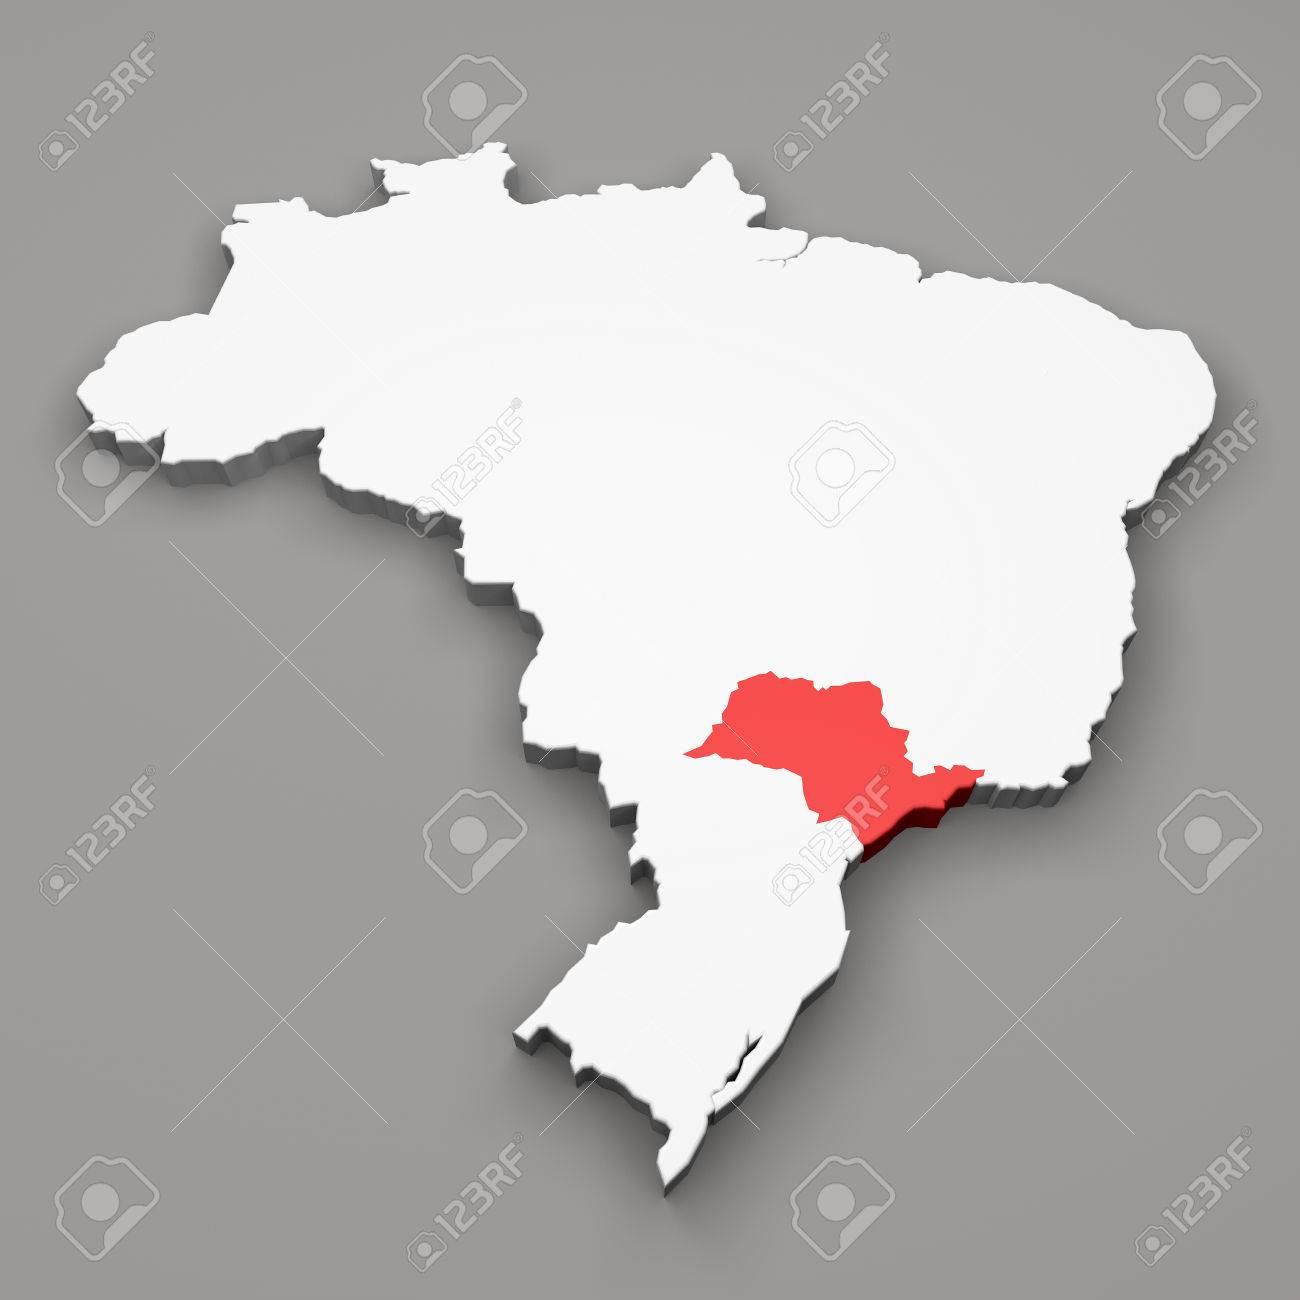 Sao Paulo State Map.Sao Paulo State On Map Of Brazil On Gray Background Stock Photo